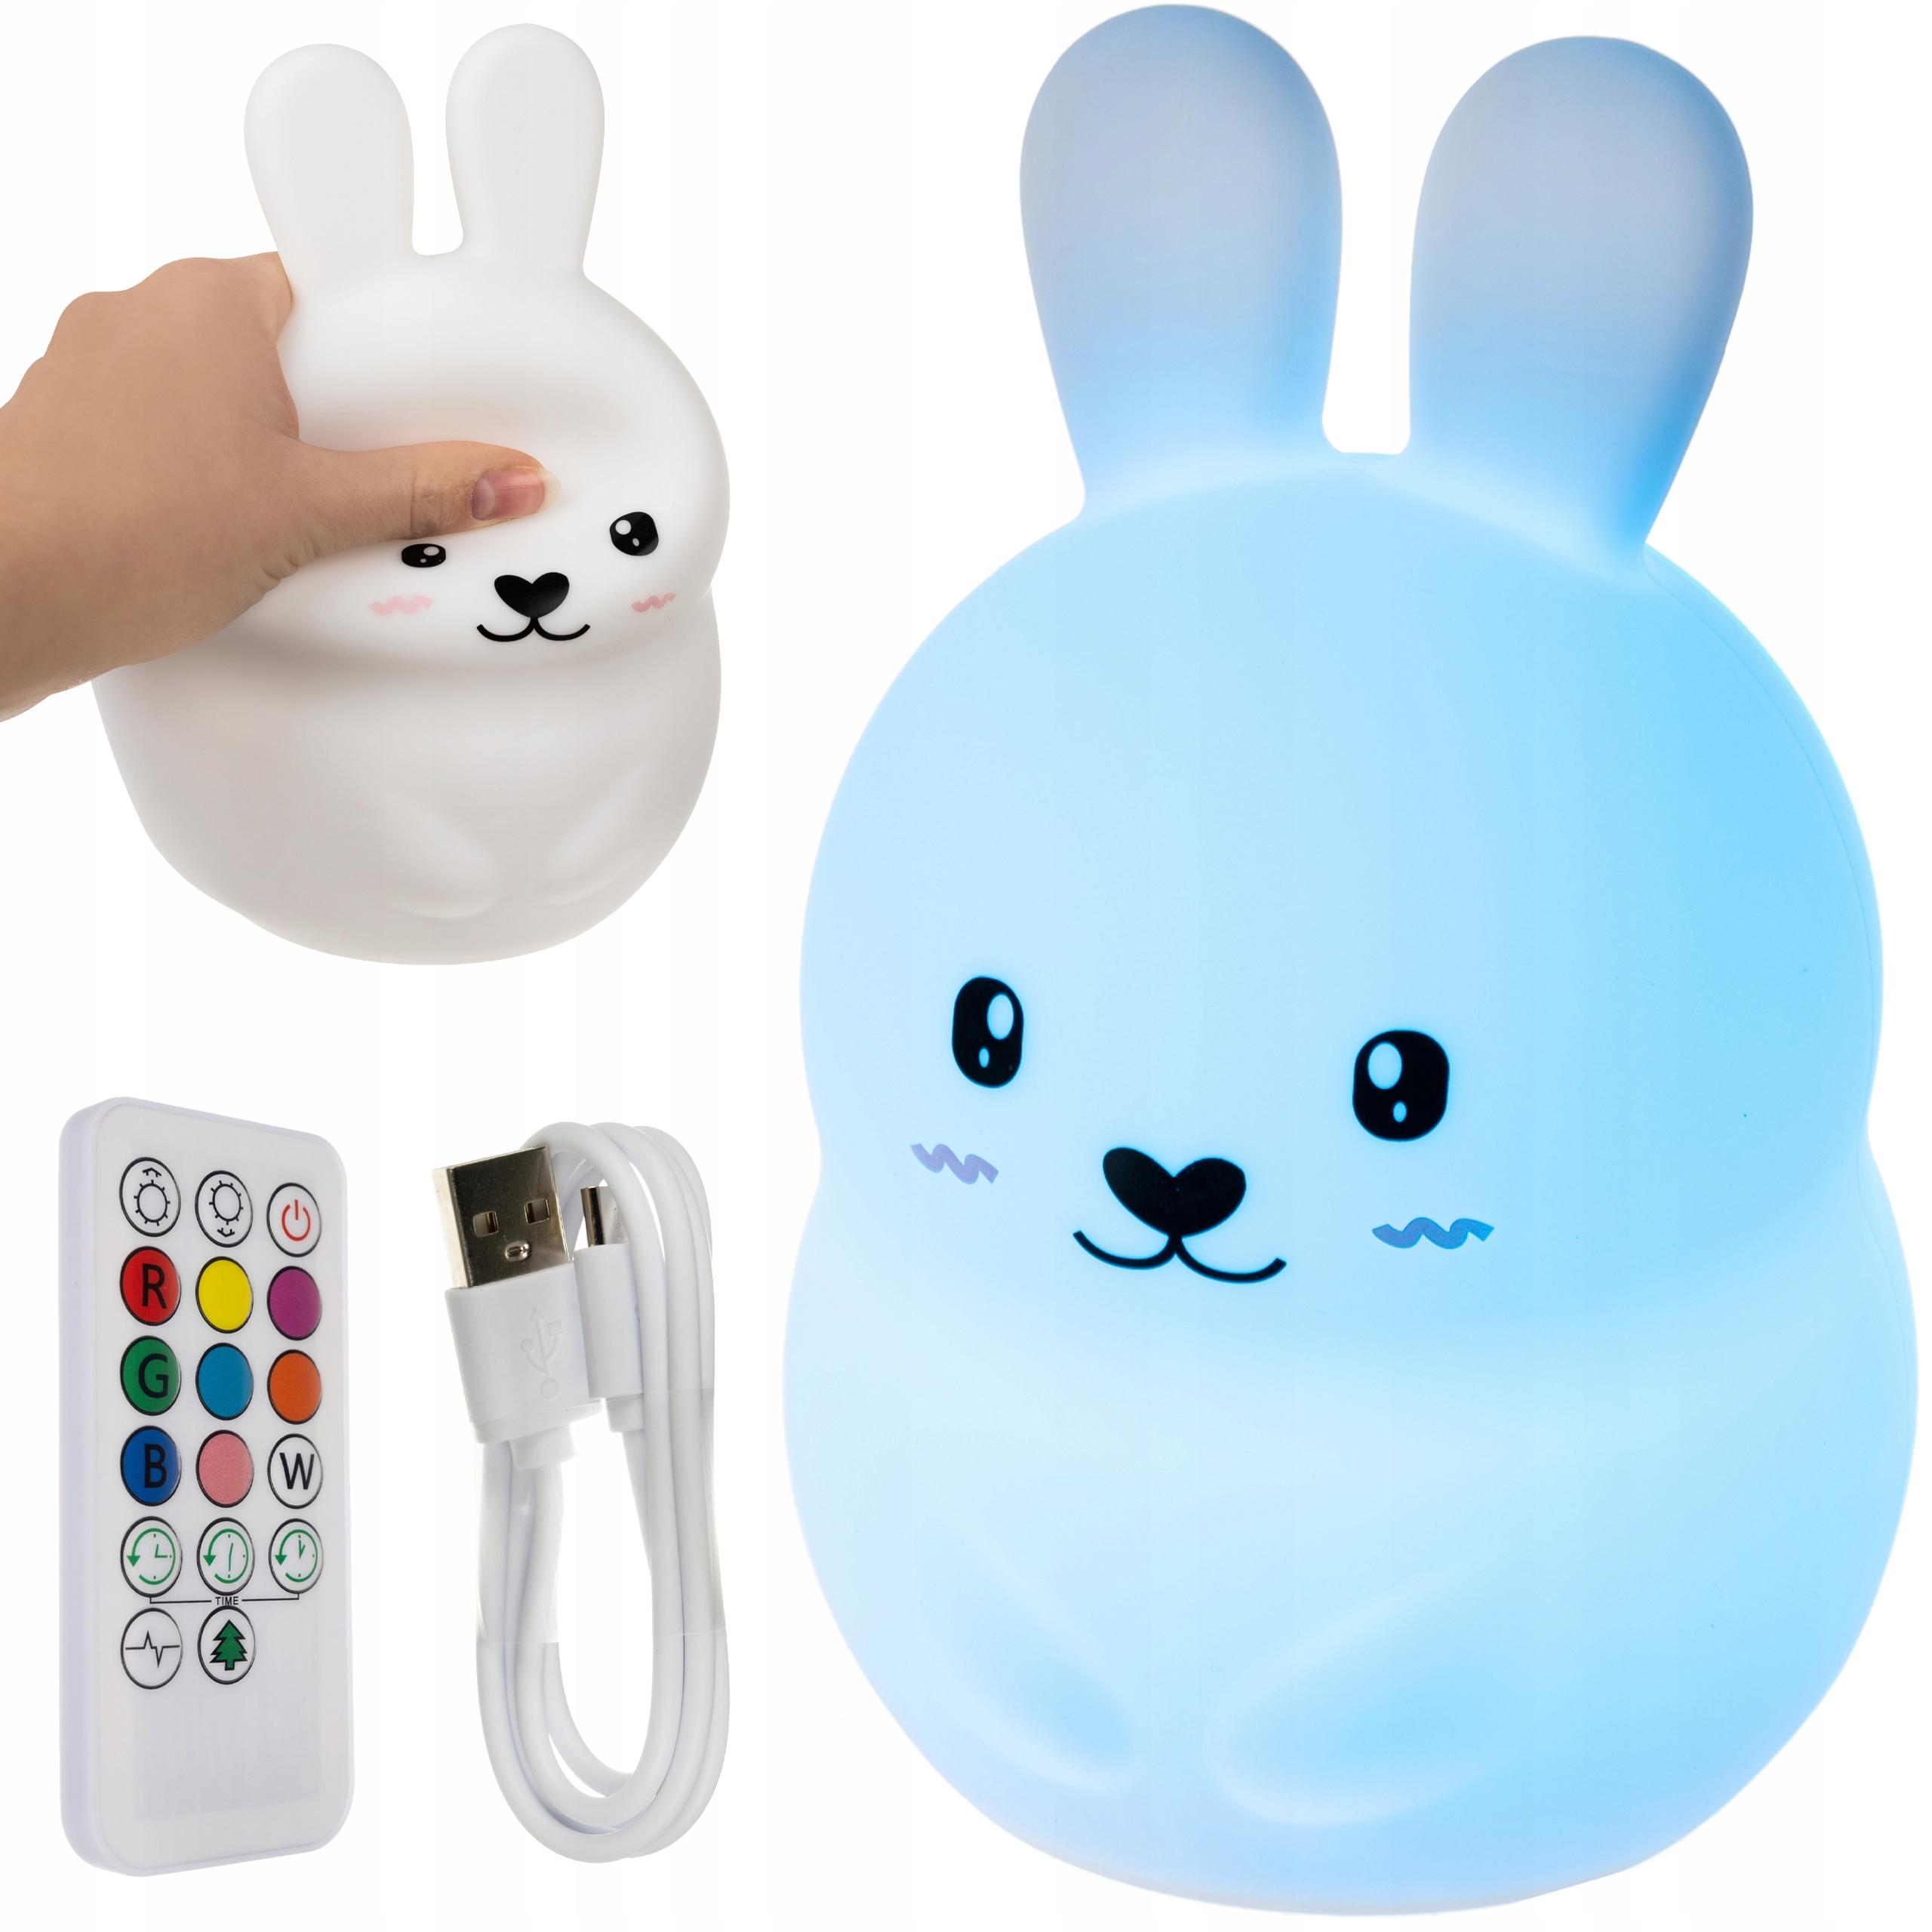 Lampka Nocna LED dla Dzieci Królik RGB + Pilot